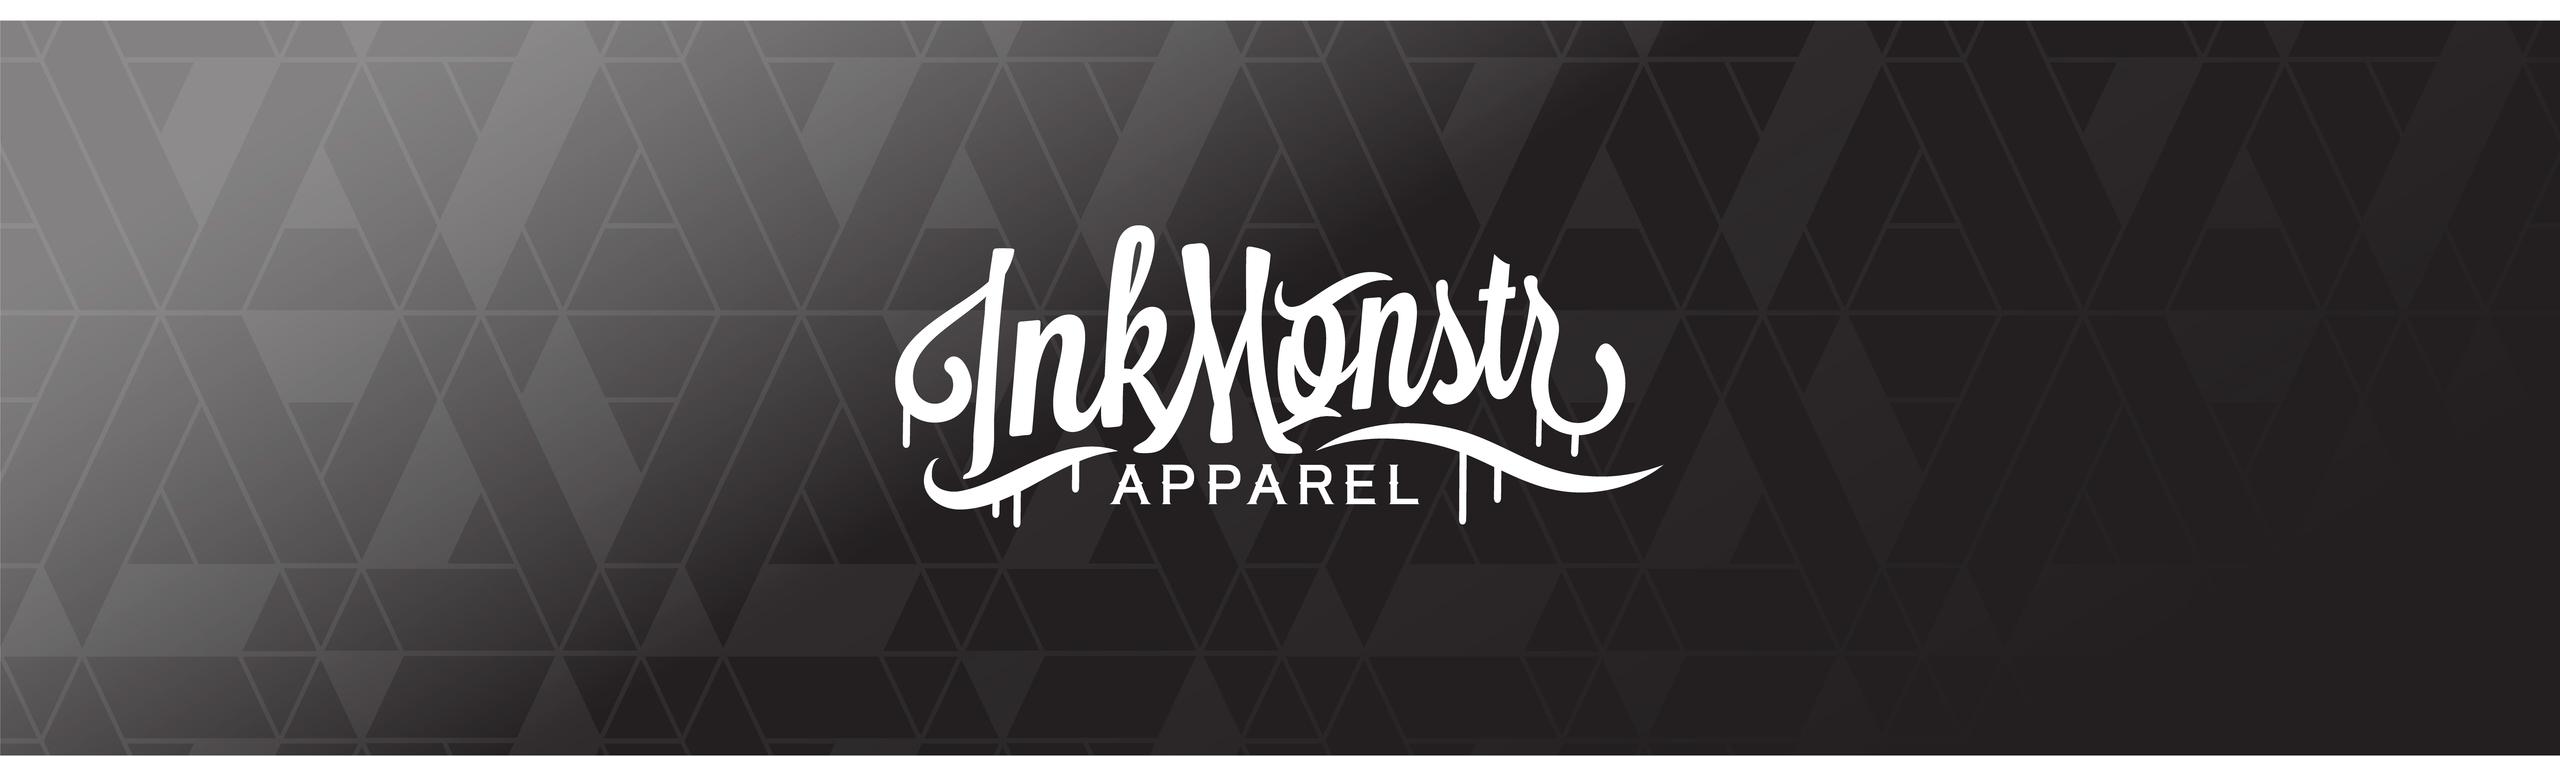 Ink Monstr Apparel (@inkmonstrapparel) Cover Image